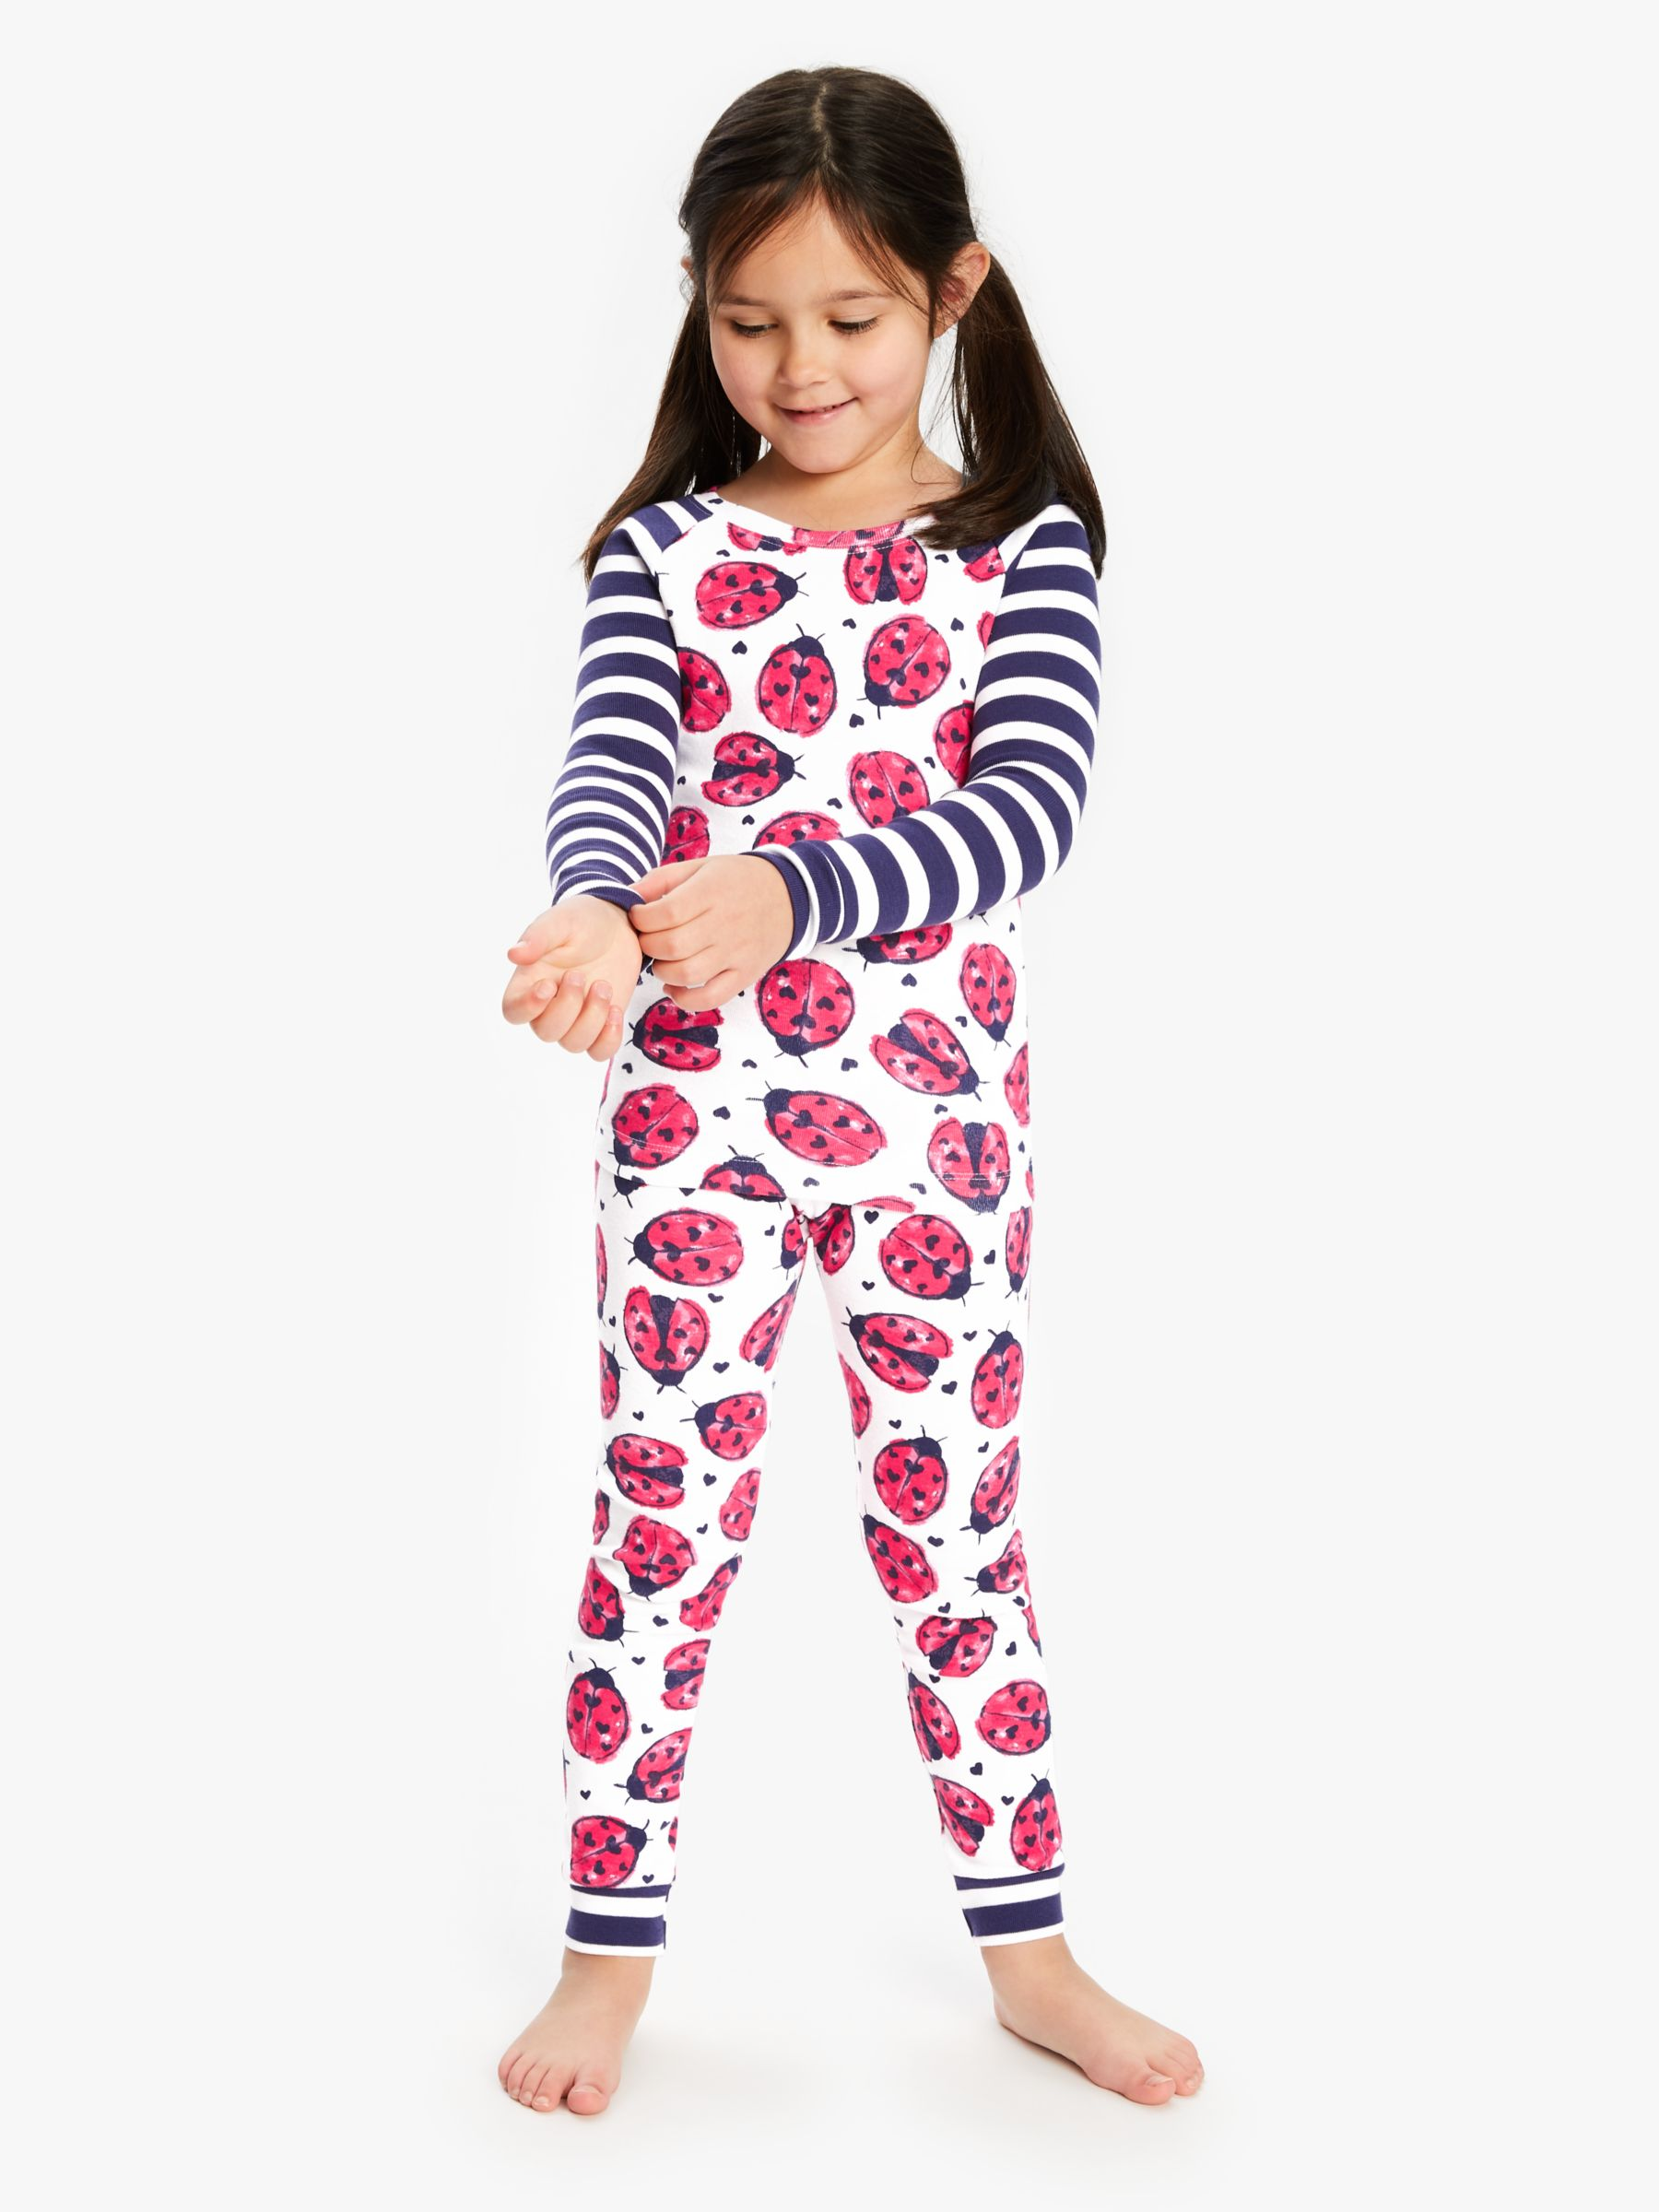 Hatley Hatley Girls' Lovebugs Print Pyjamas, Multi